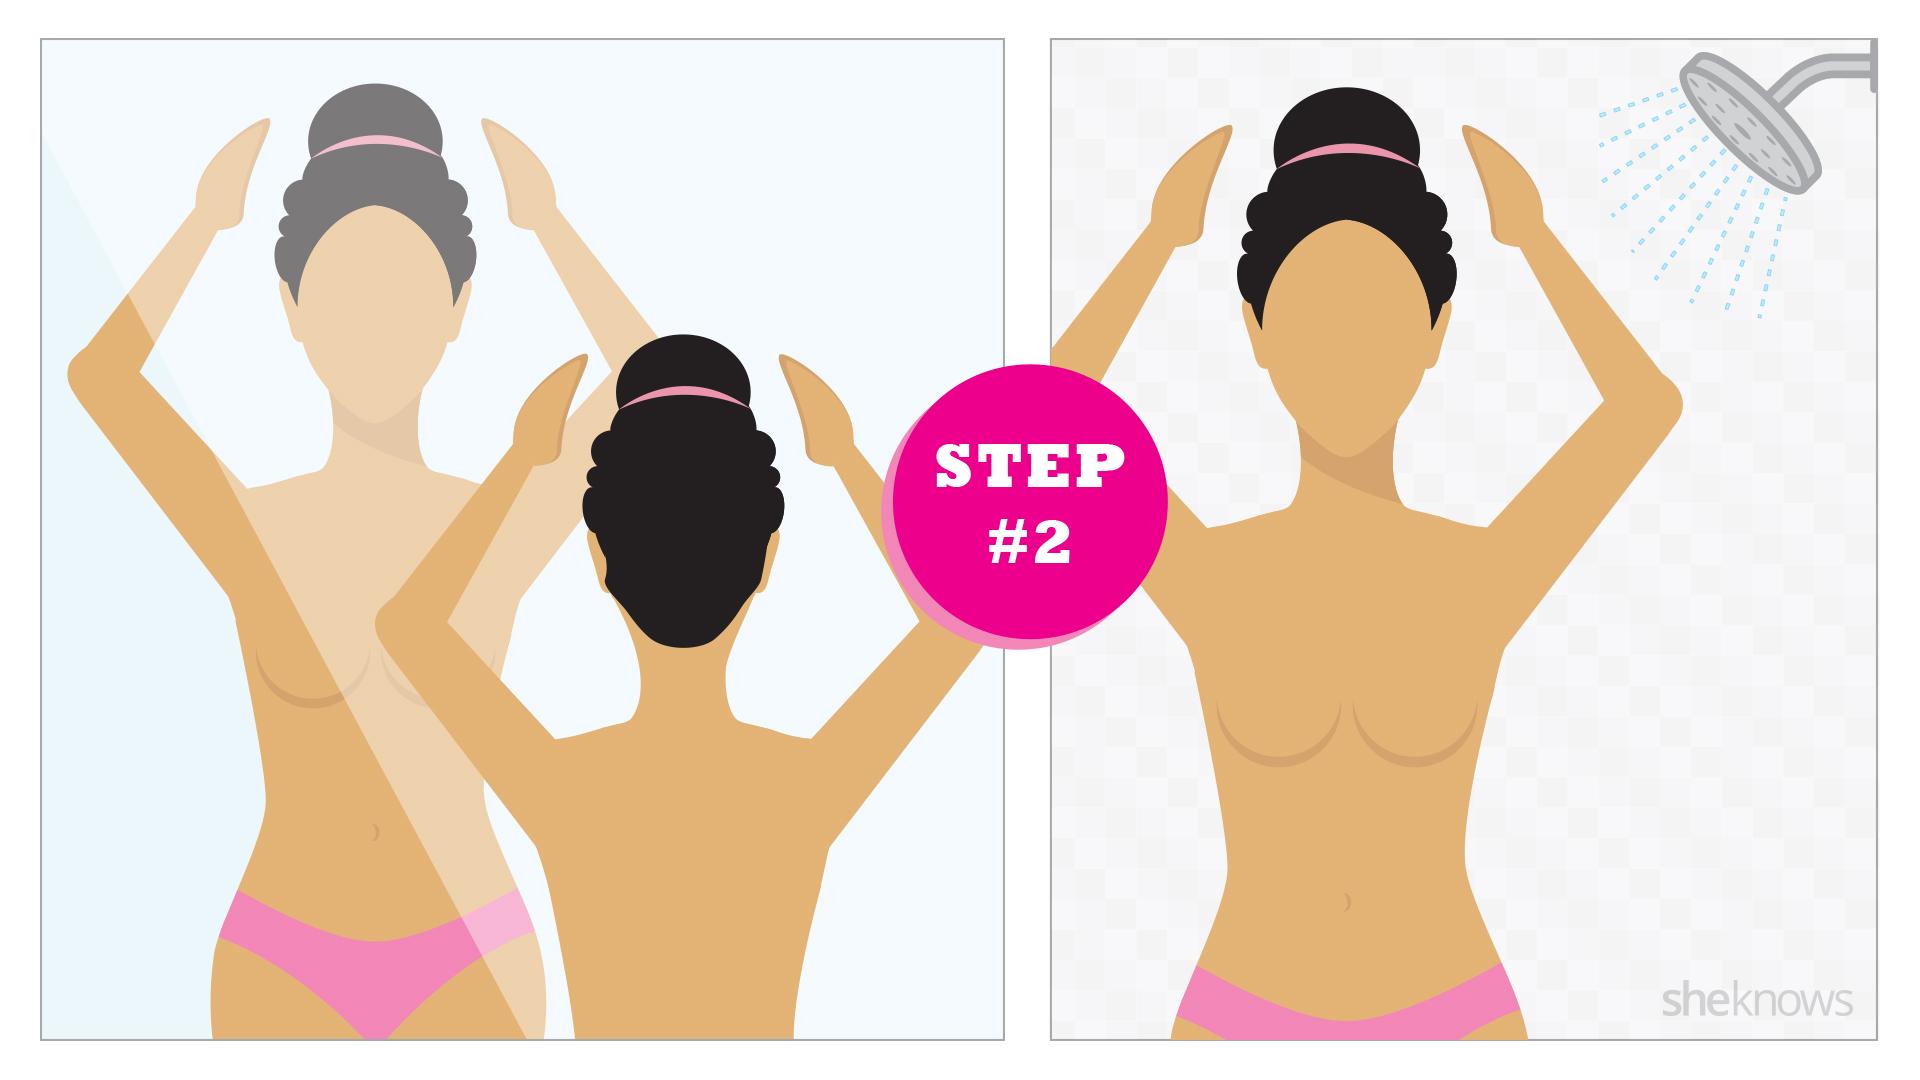 Breast self exam step 2